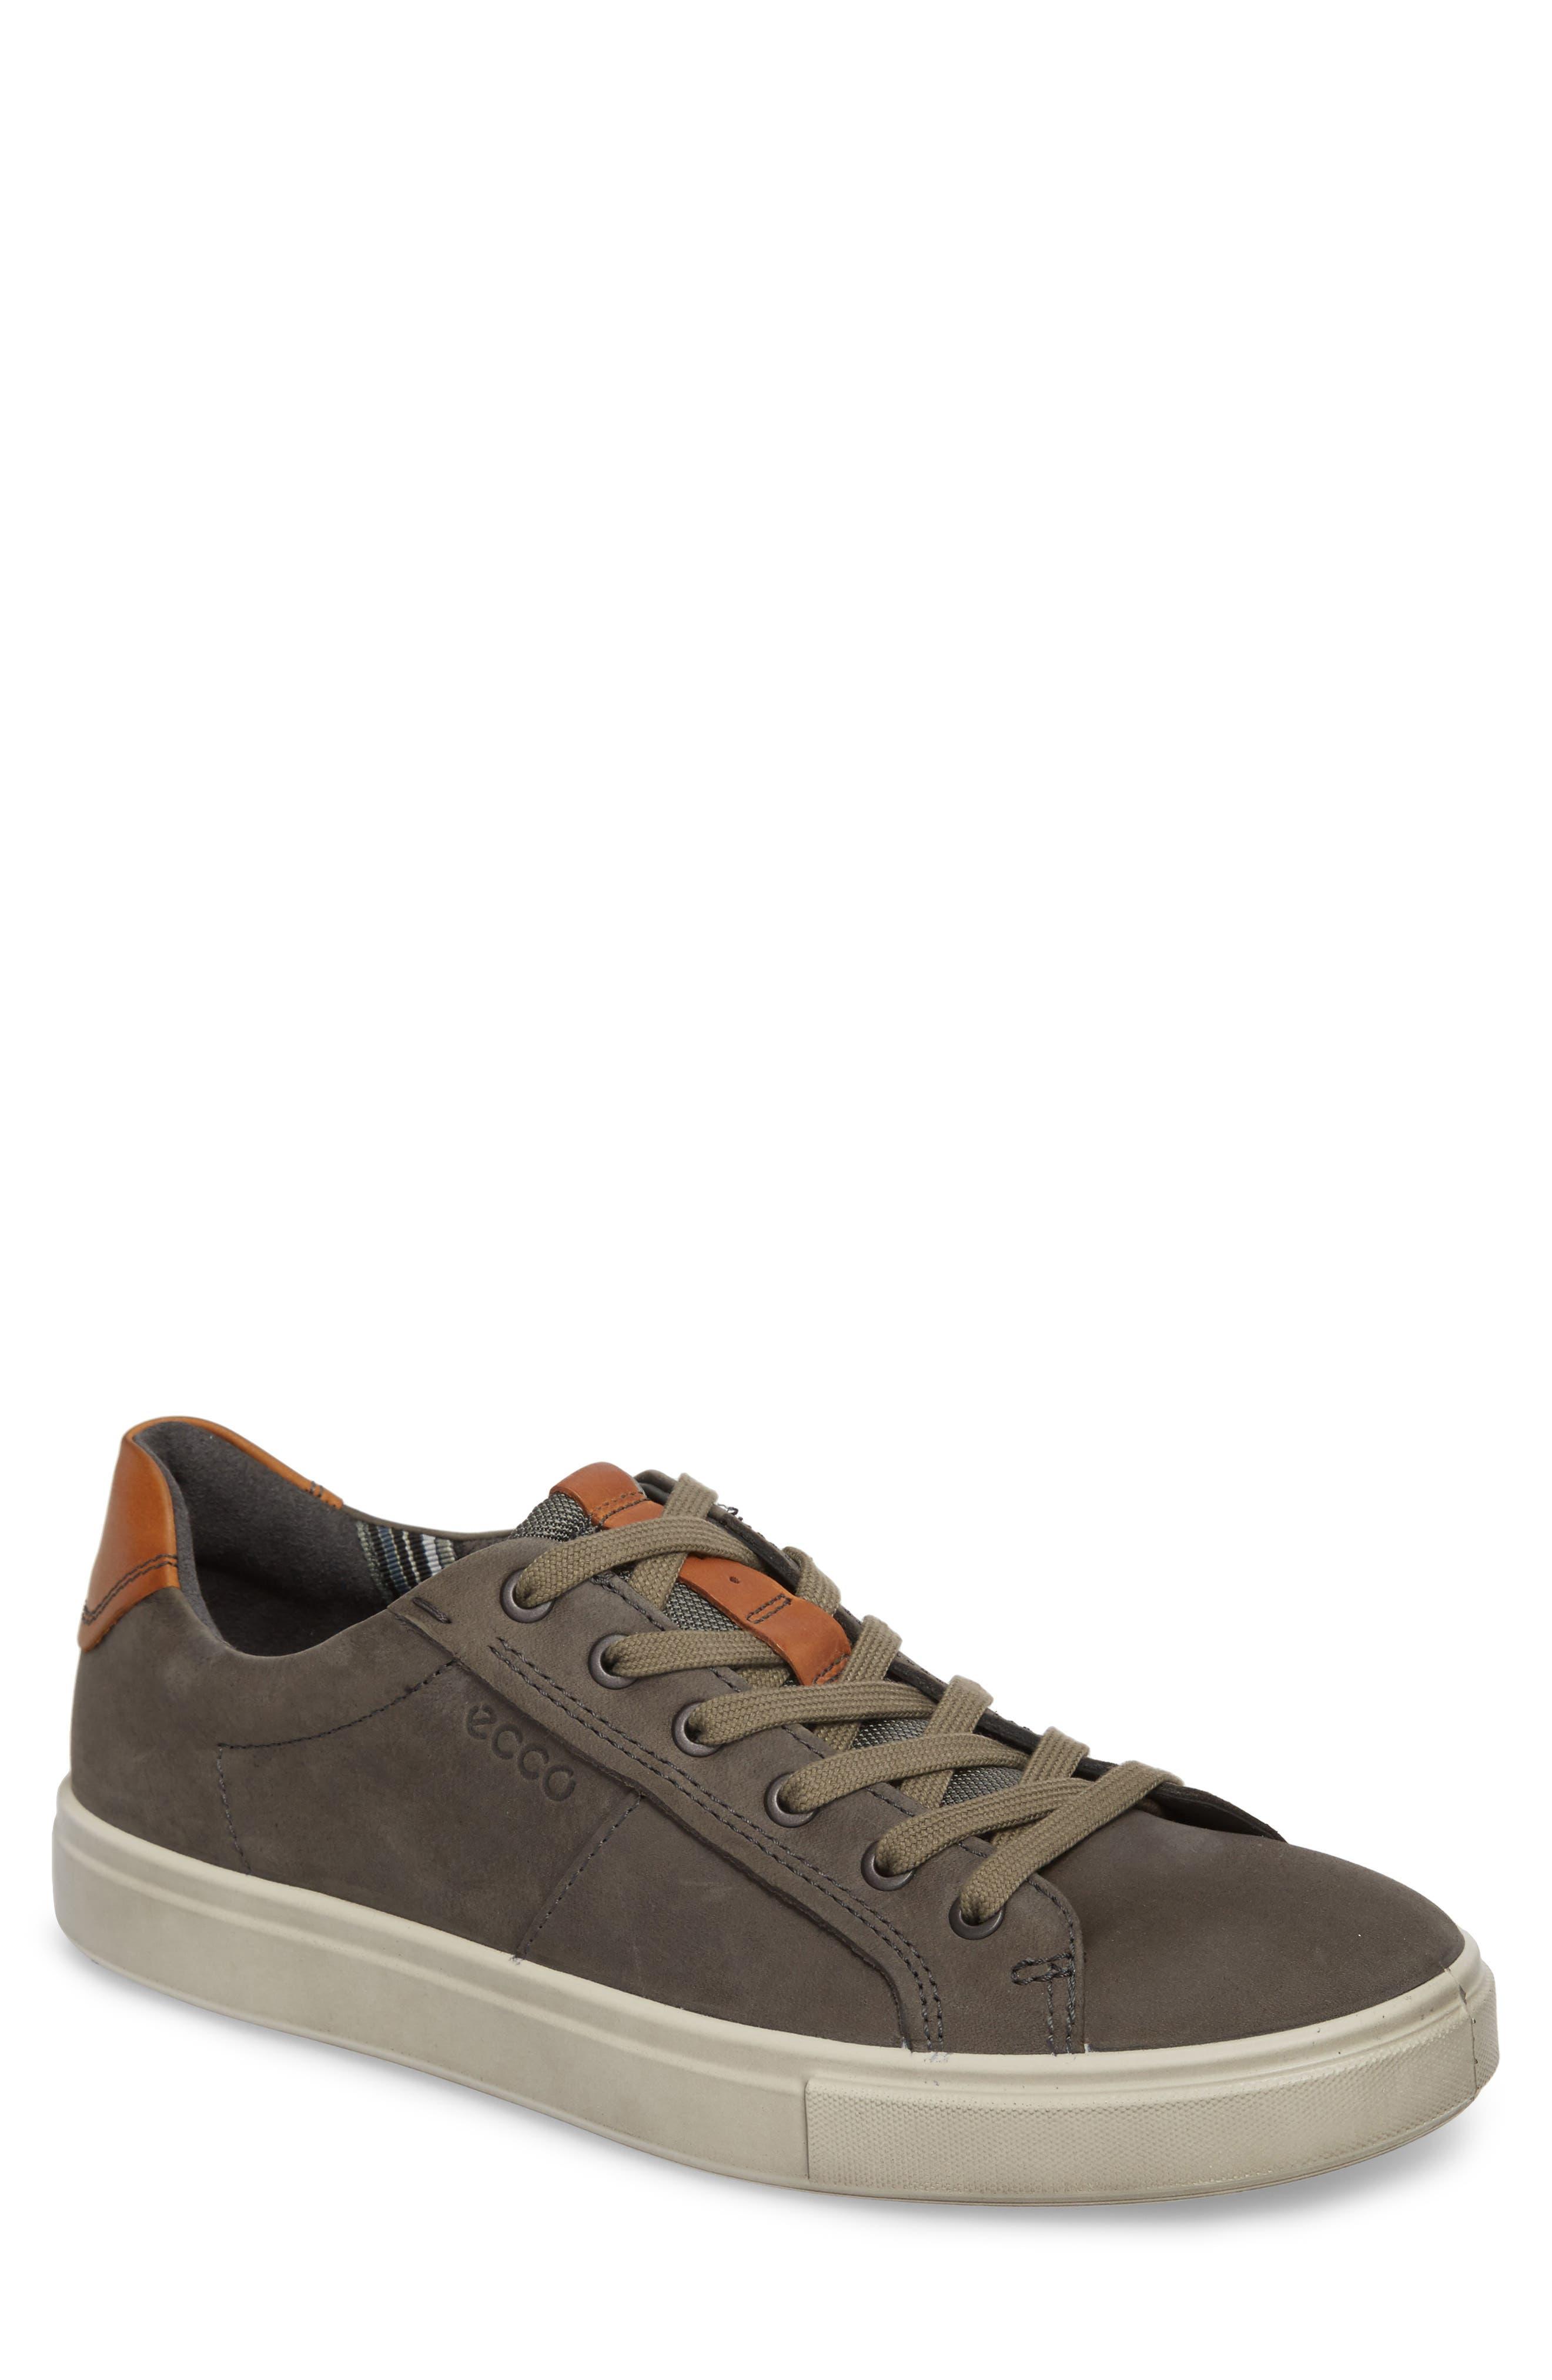 Kyle Sneaker,                             Main thumbnail 1, color,                             098